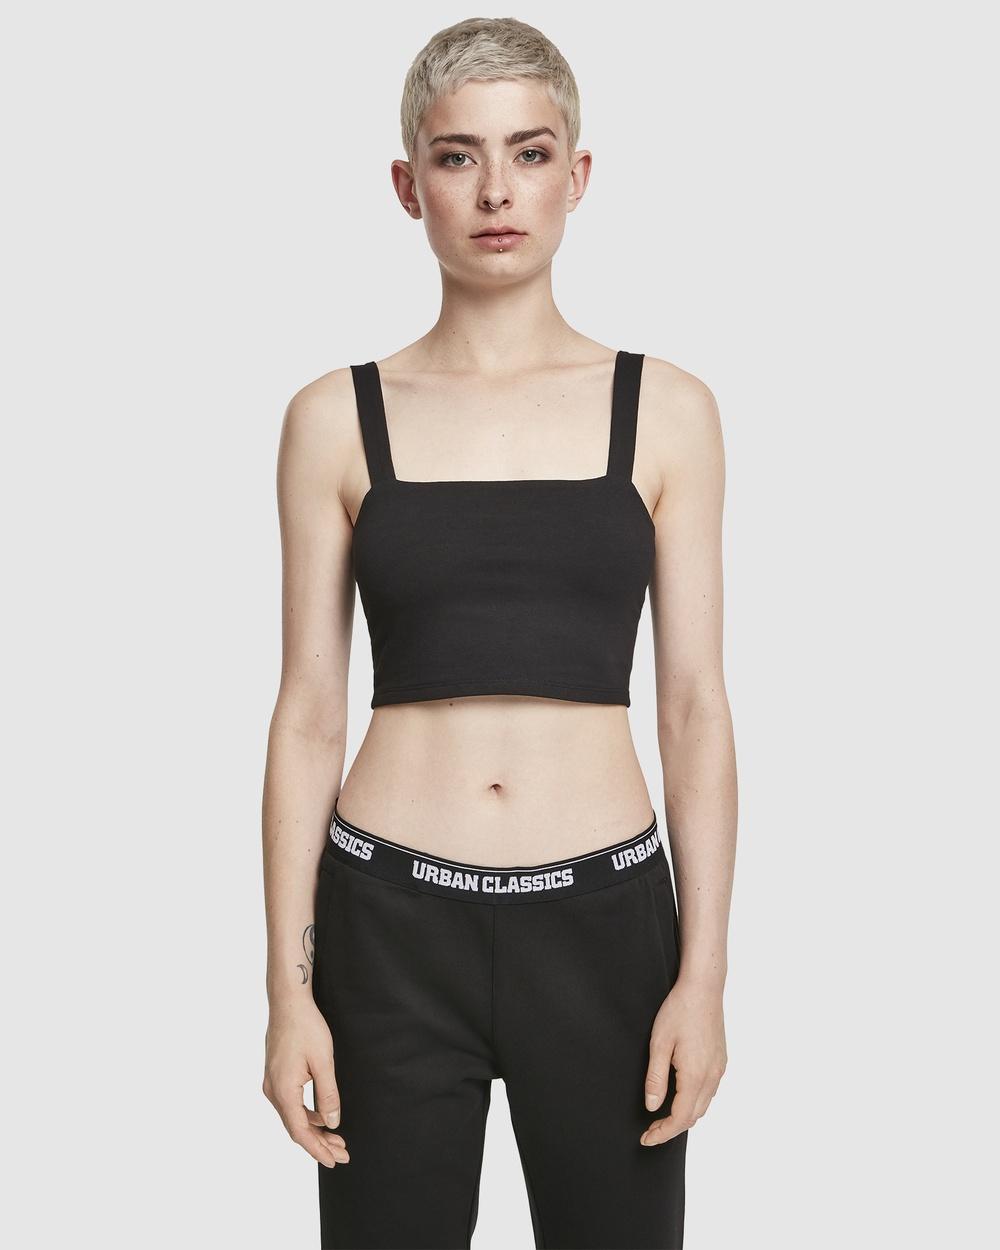 Urban Classics UC Ladies Casual Cropped Top Tops Black